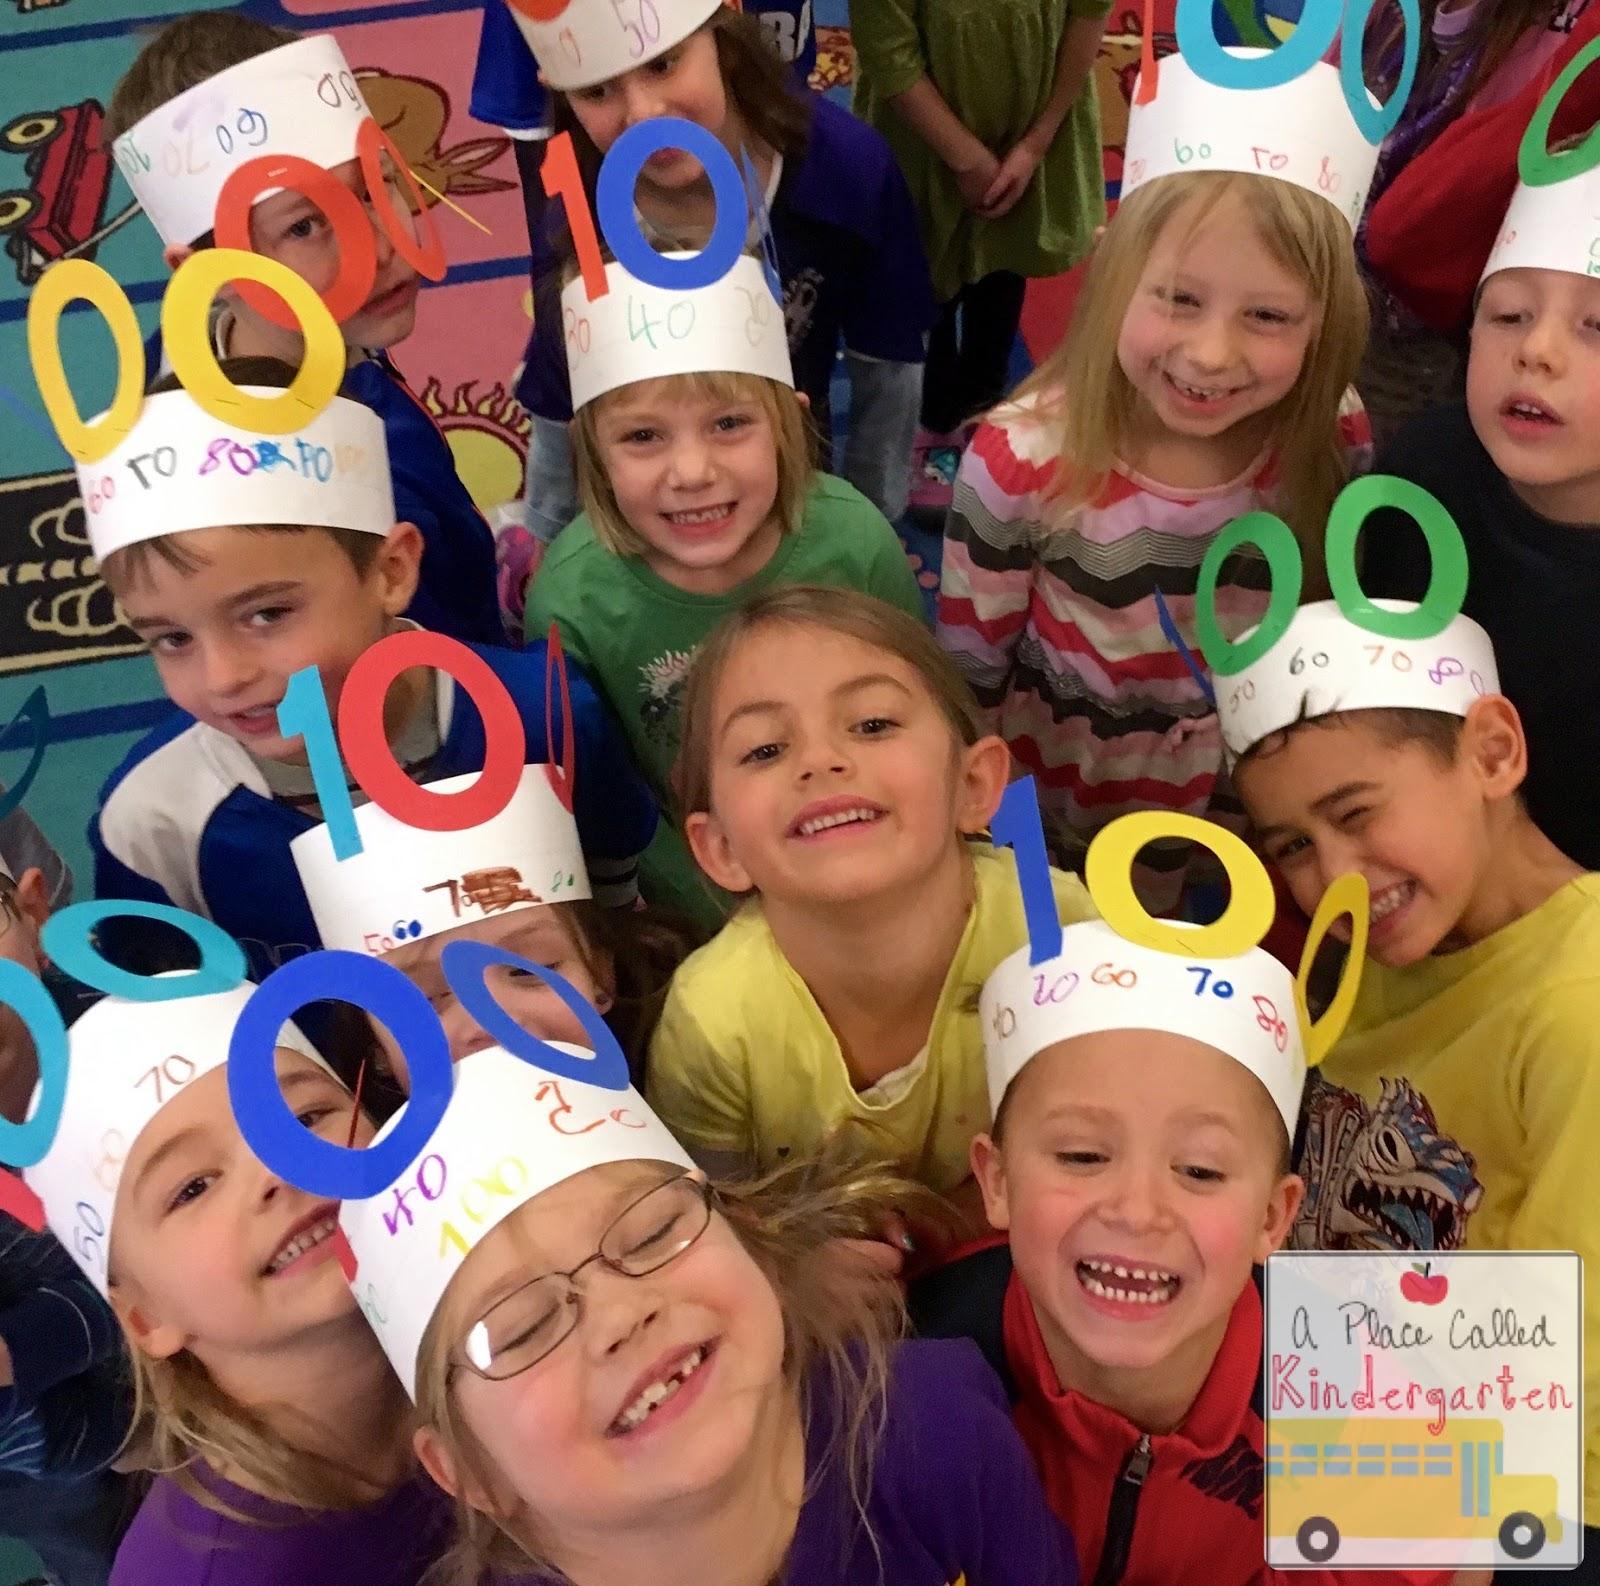 A Place Called Kindergarten 100th Day Fun In Kindergarten